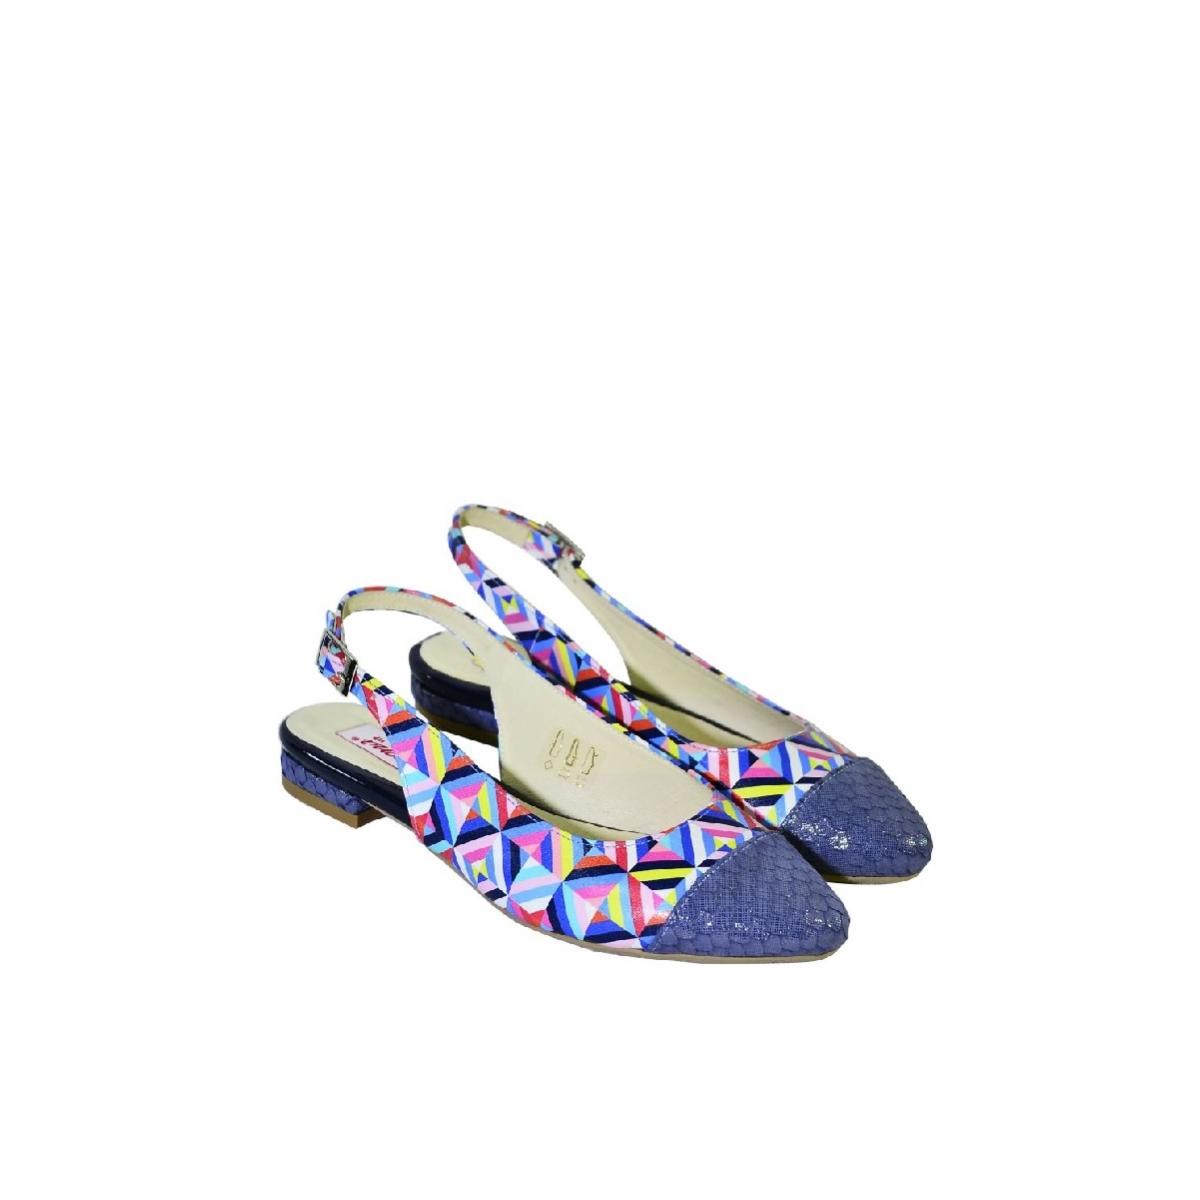 f21a97061 Modré farebné sandále bez opätku Carsona MIRI | Johnc.sk